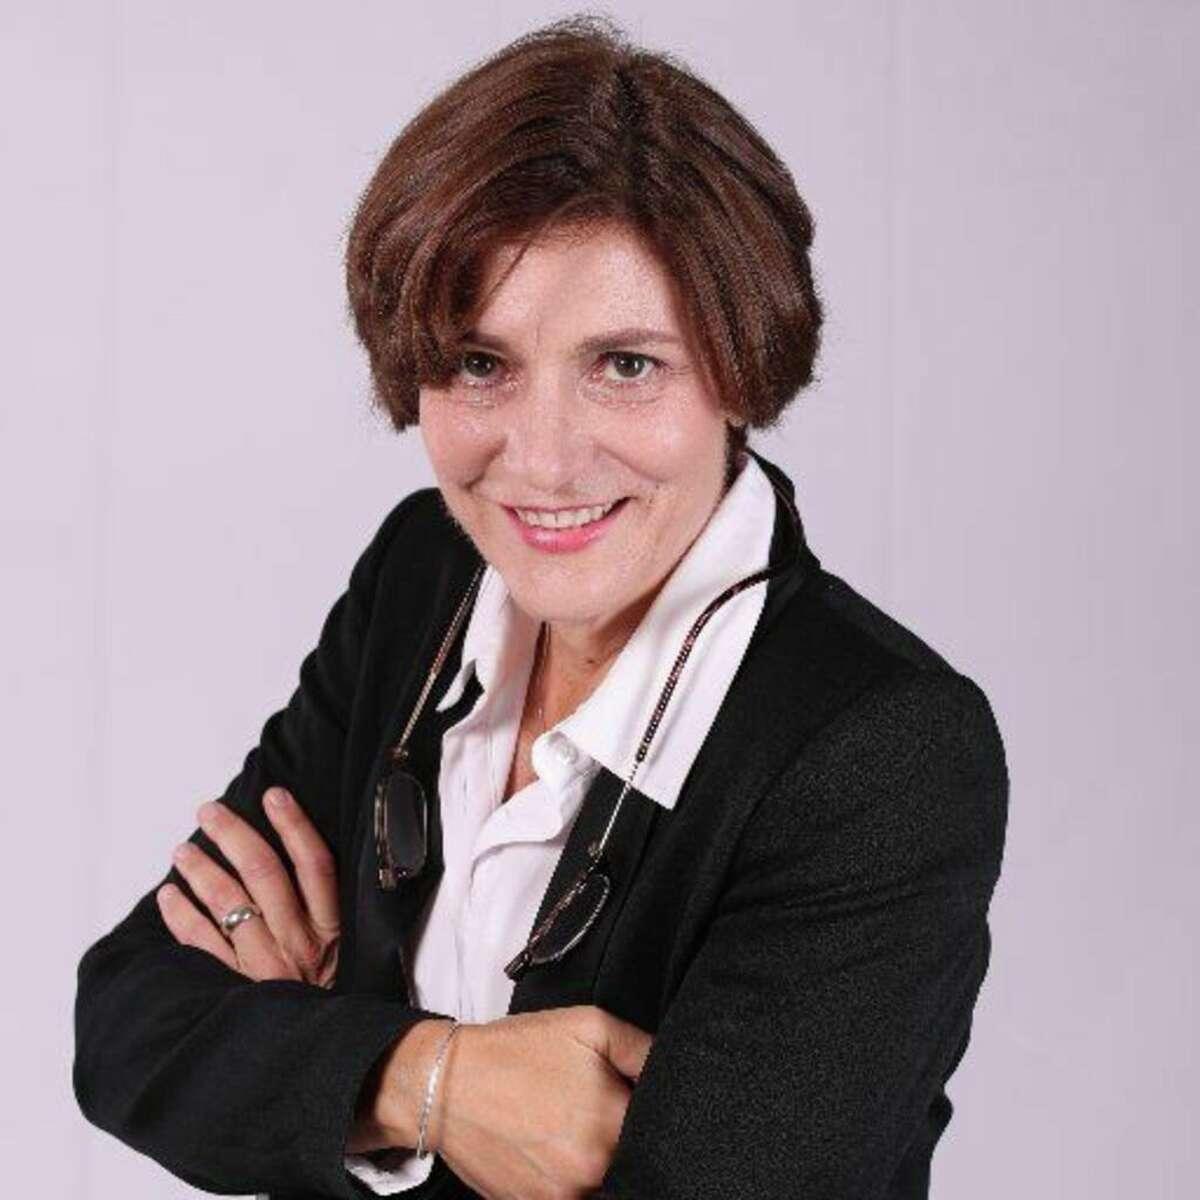 Digit Murphy, hockey coach of the Toronto Six, is a women's sports advocate and trailblazer.